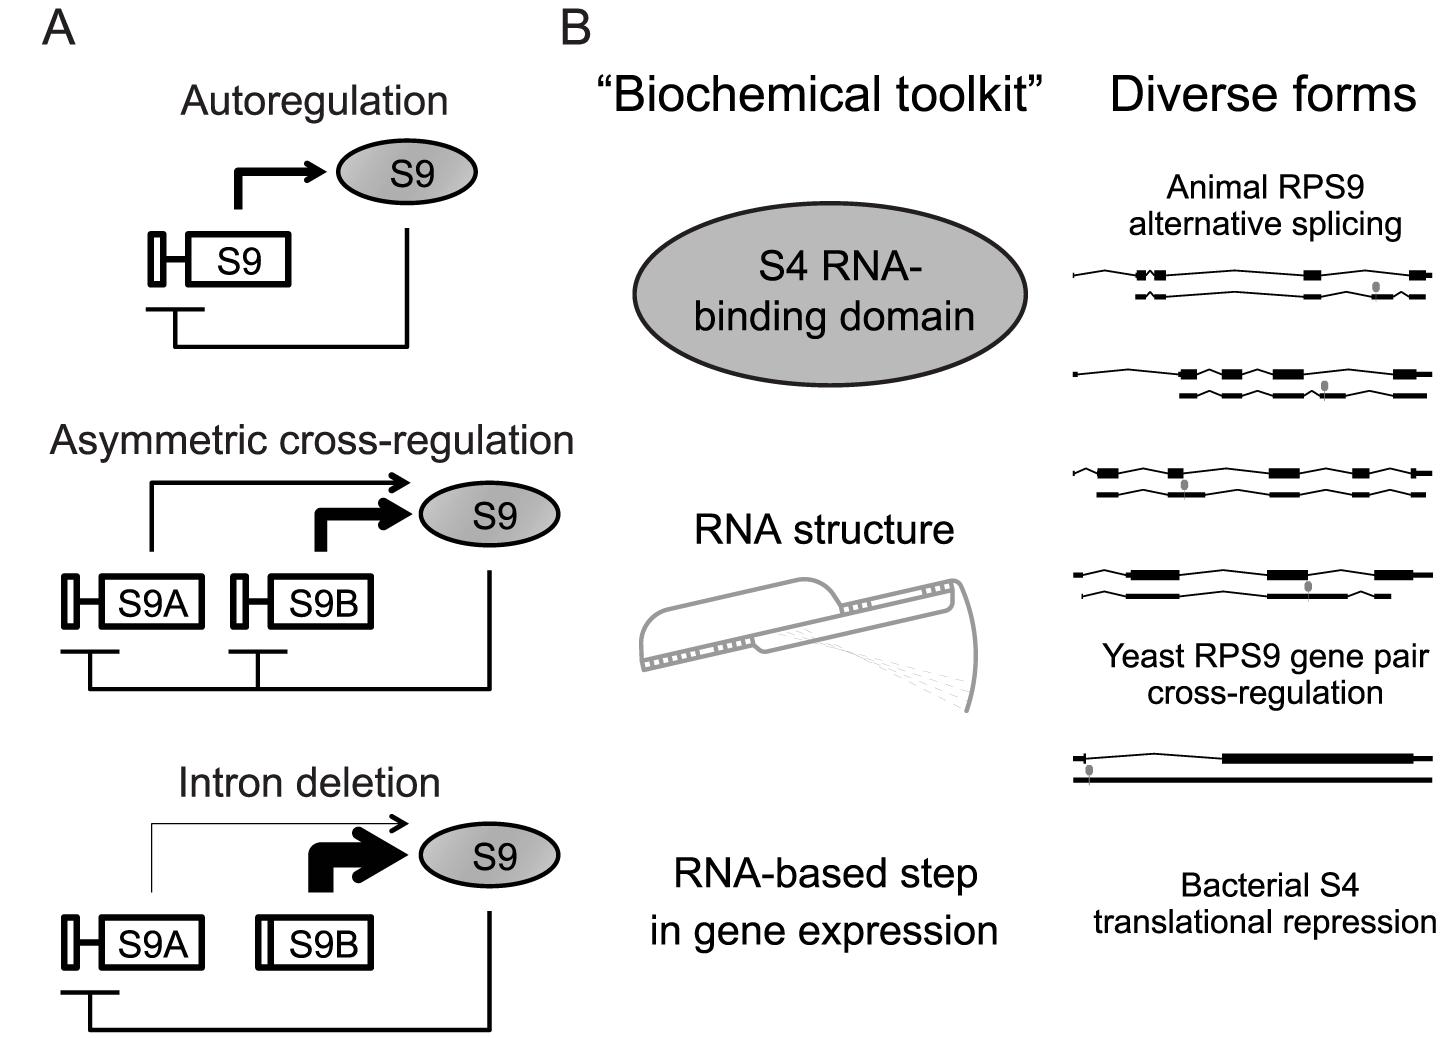 Hypothetical evolution of <i>RPS9</i> autoregulation.